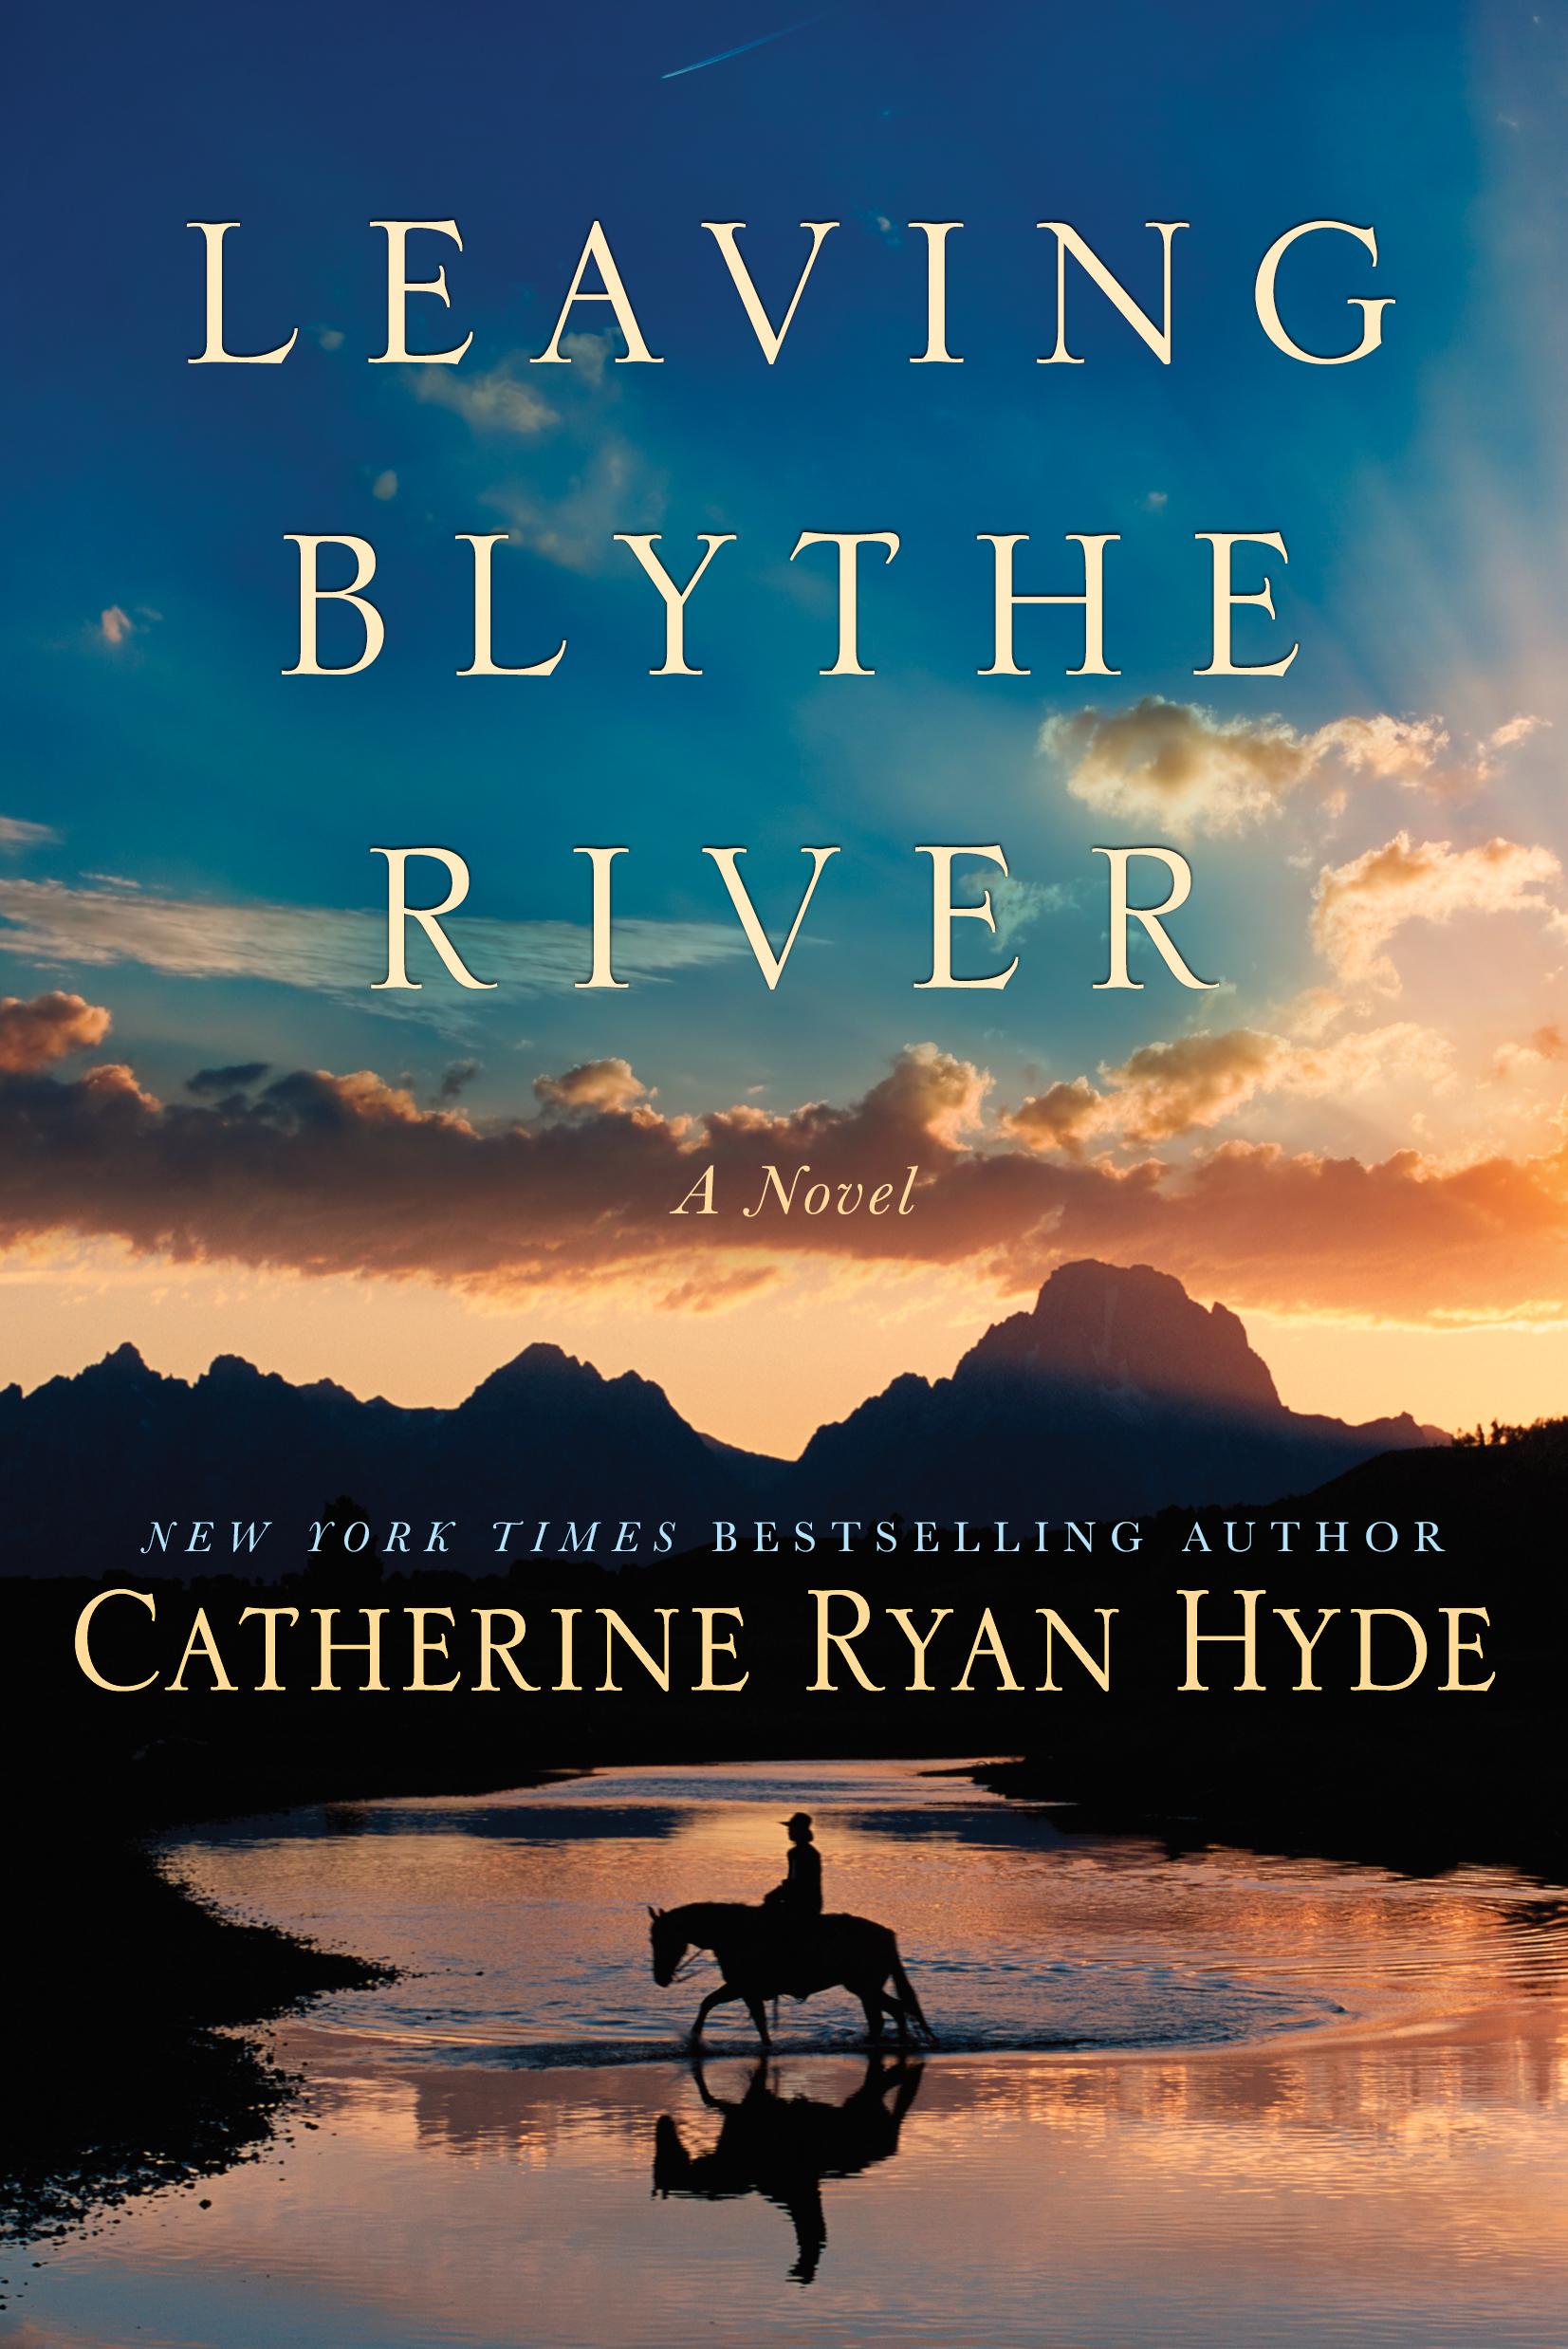 Hyde-LeavingBlytheRiver-21739-CV-FT-v2.jpg